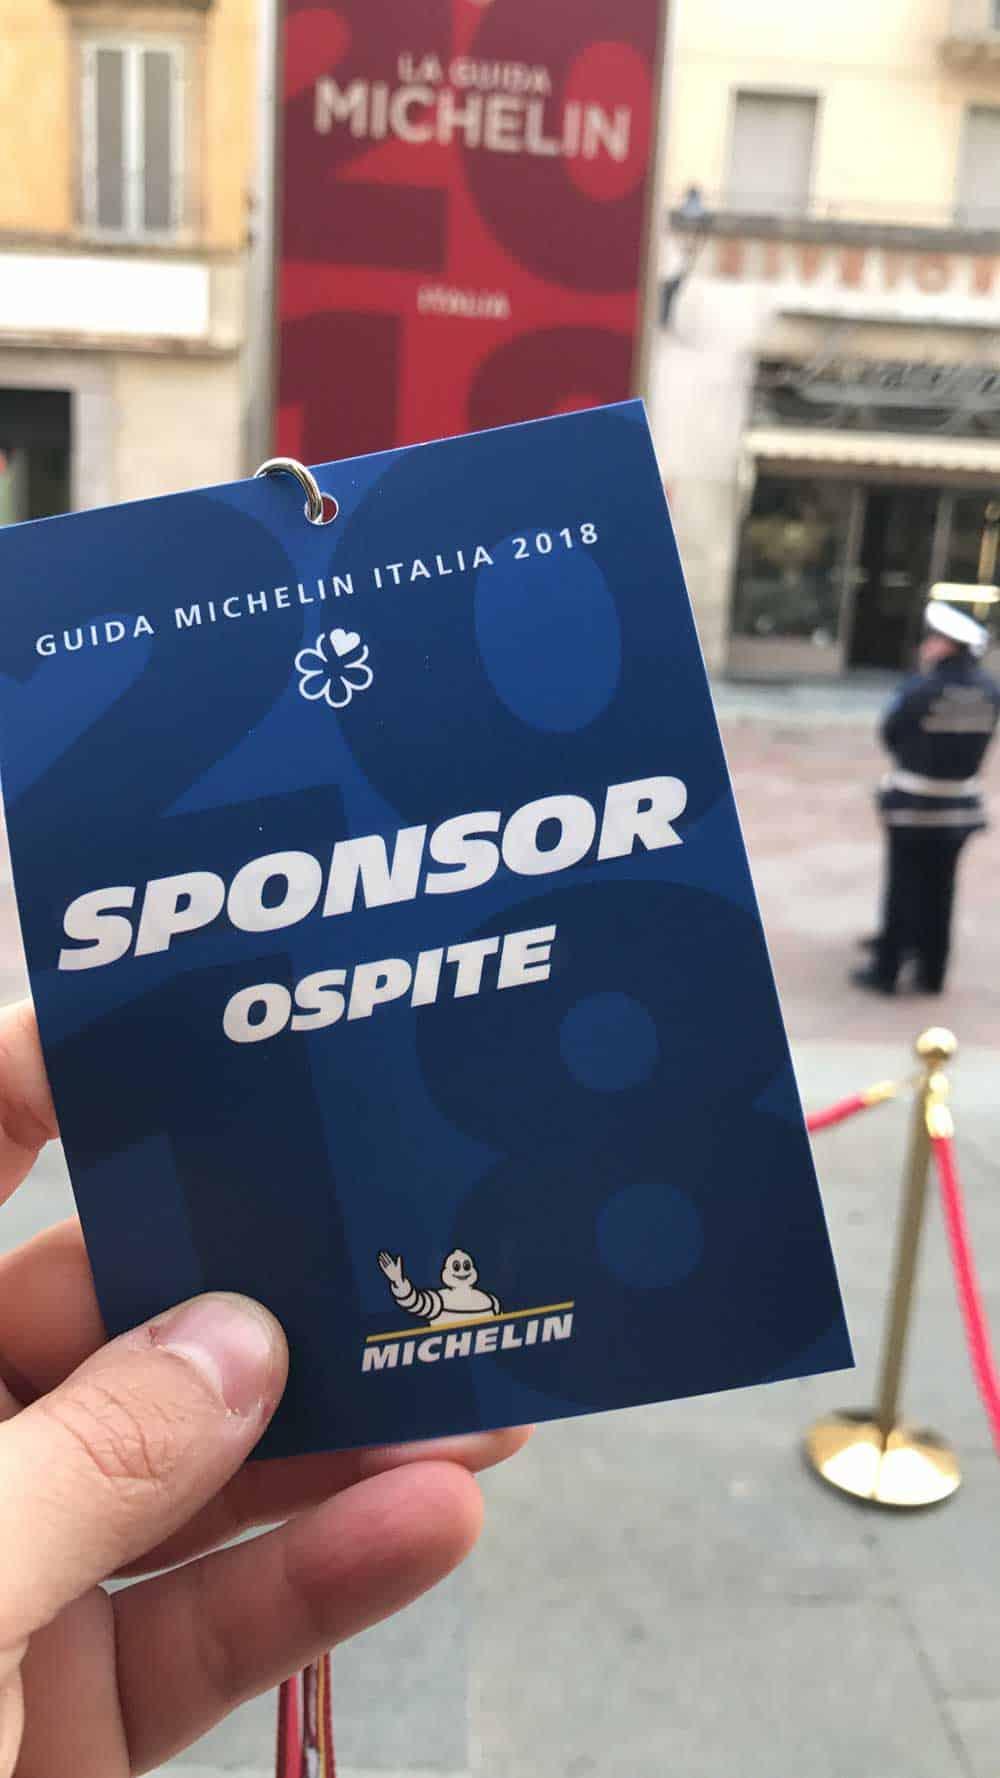 pass guida michelin 2018